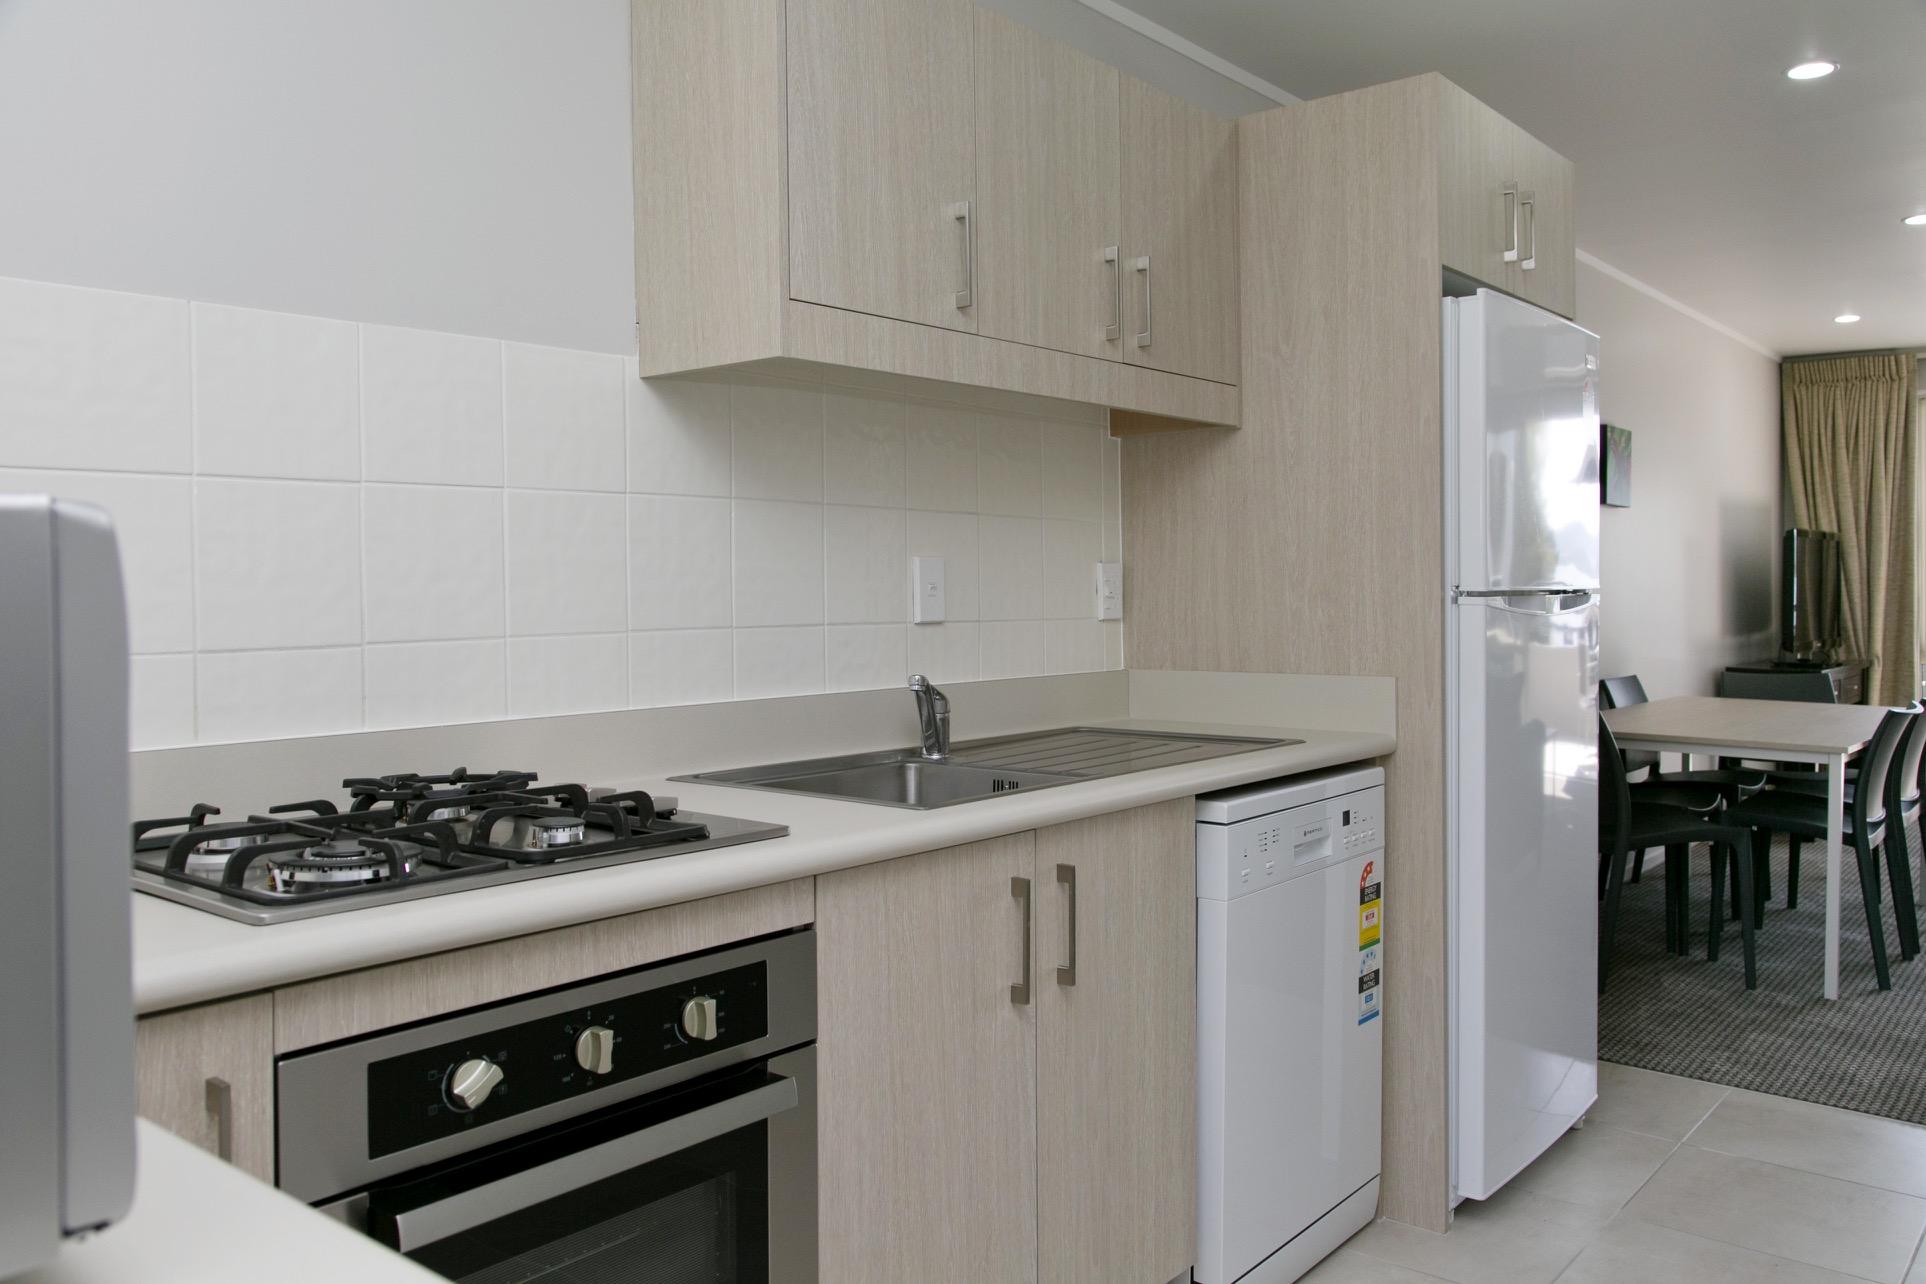 three bedroom kitchen 2.jpg